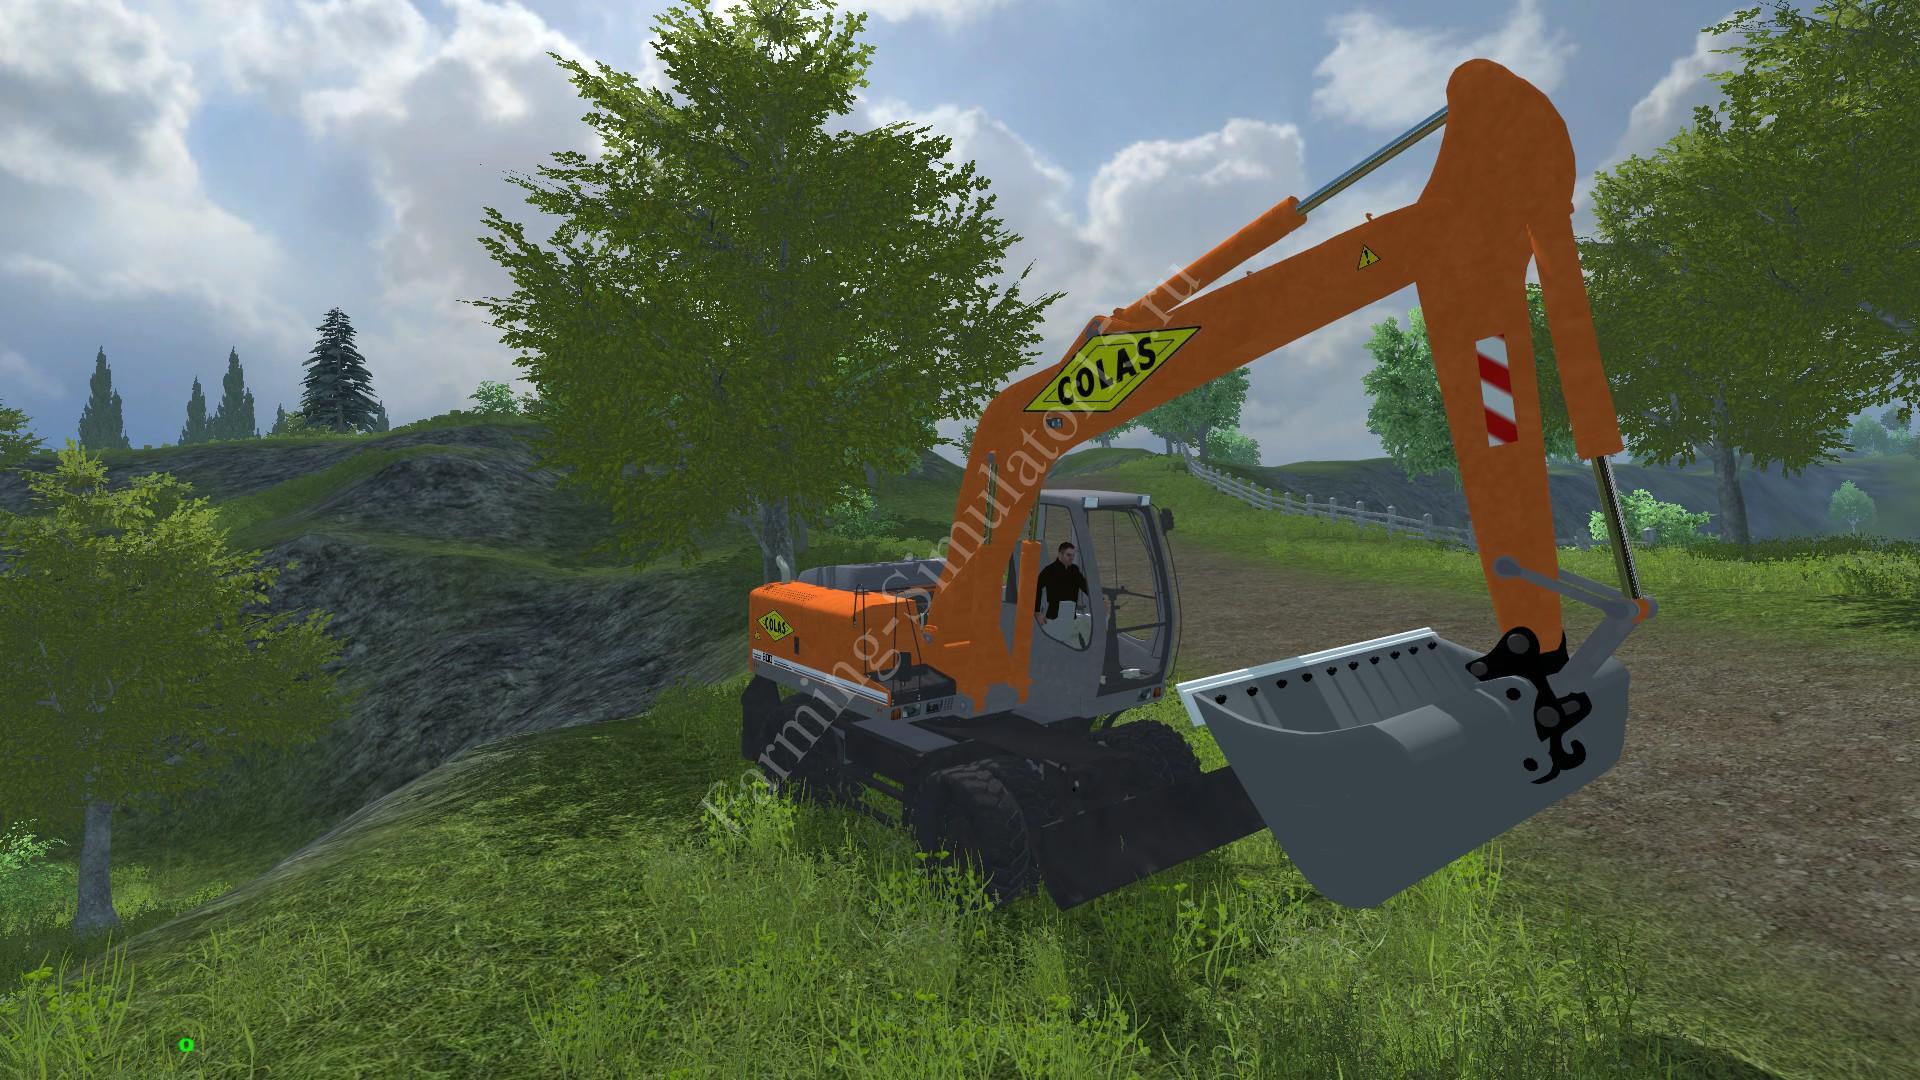 Мод экскаватора Liebherr 900c Colas v 1.0 Farming Simulator 2013, Farming Simulator 13